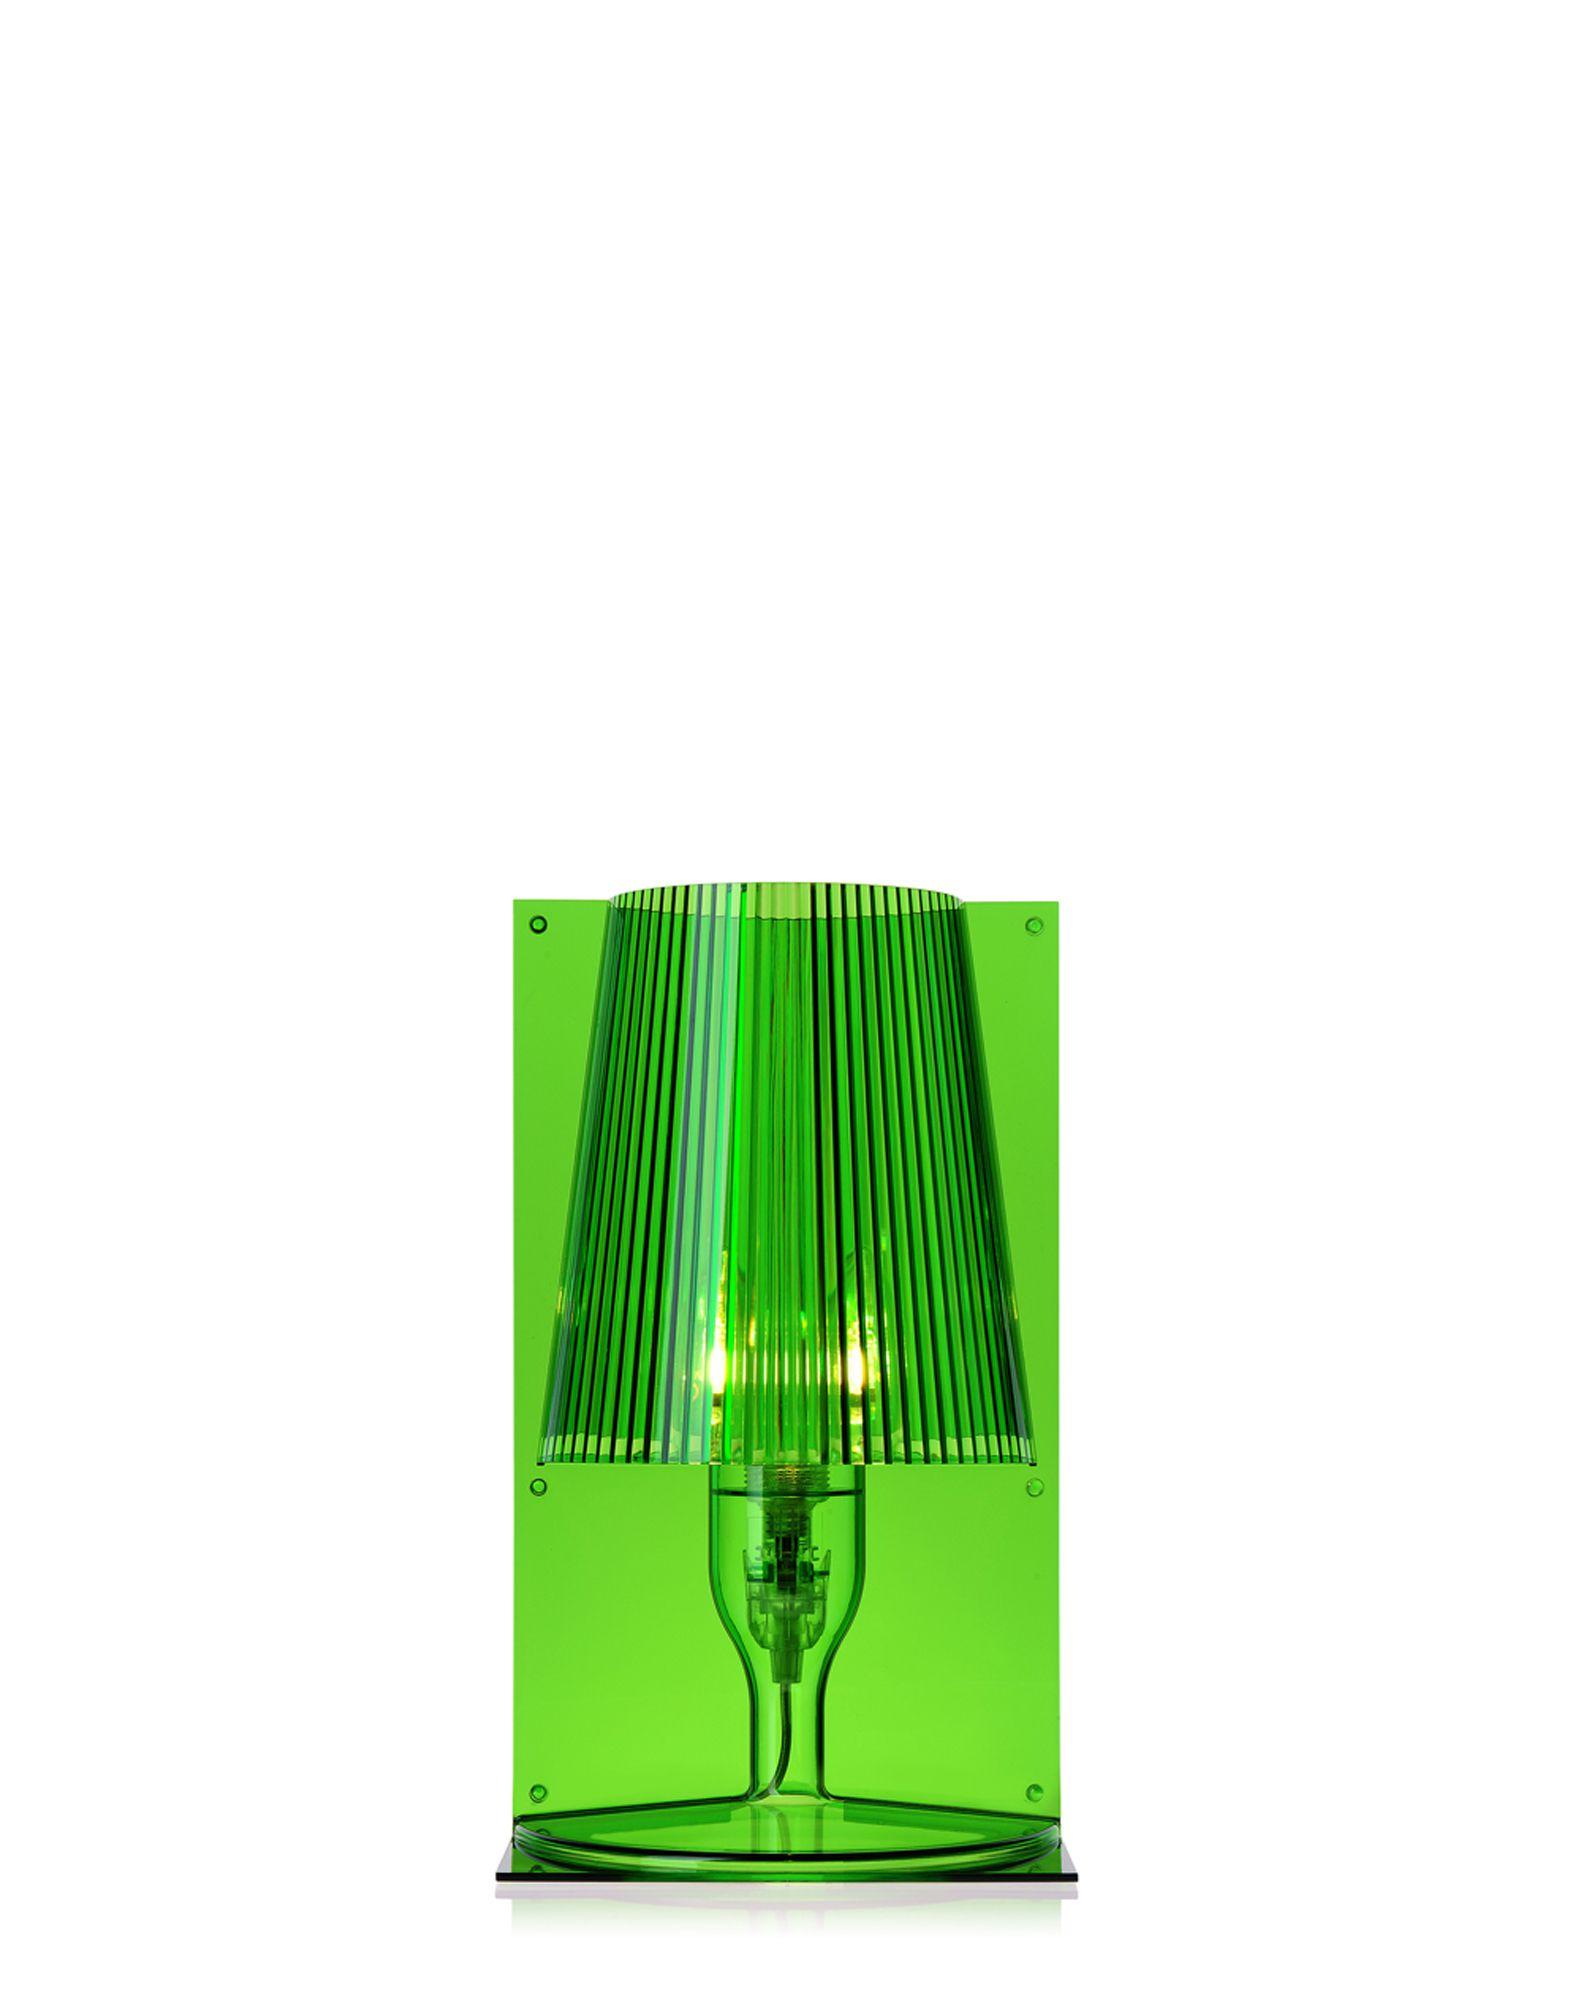 Lampadario cucina verde : lampadario x soggiorno moderno ...